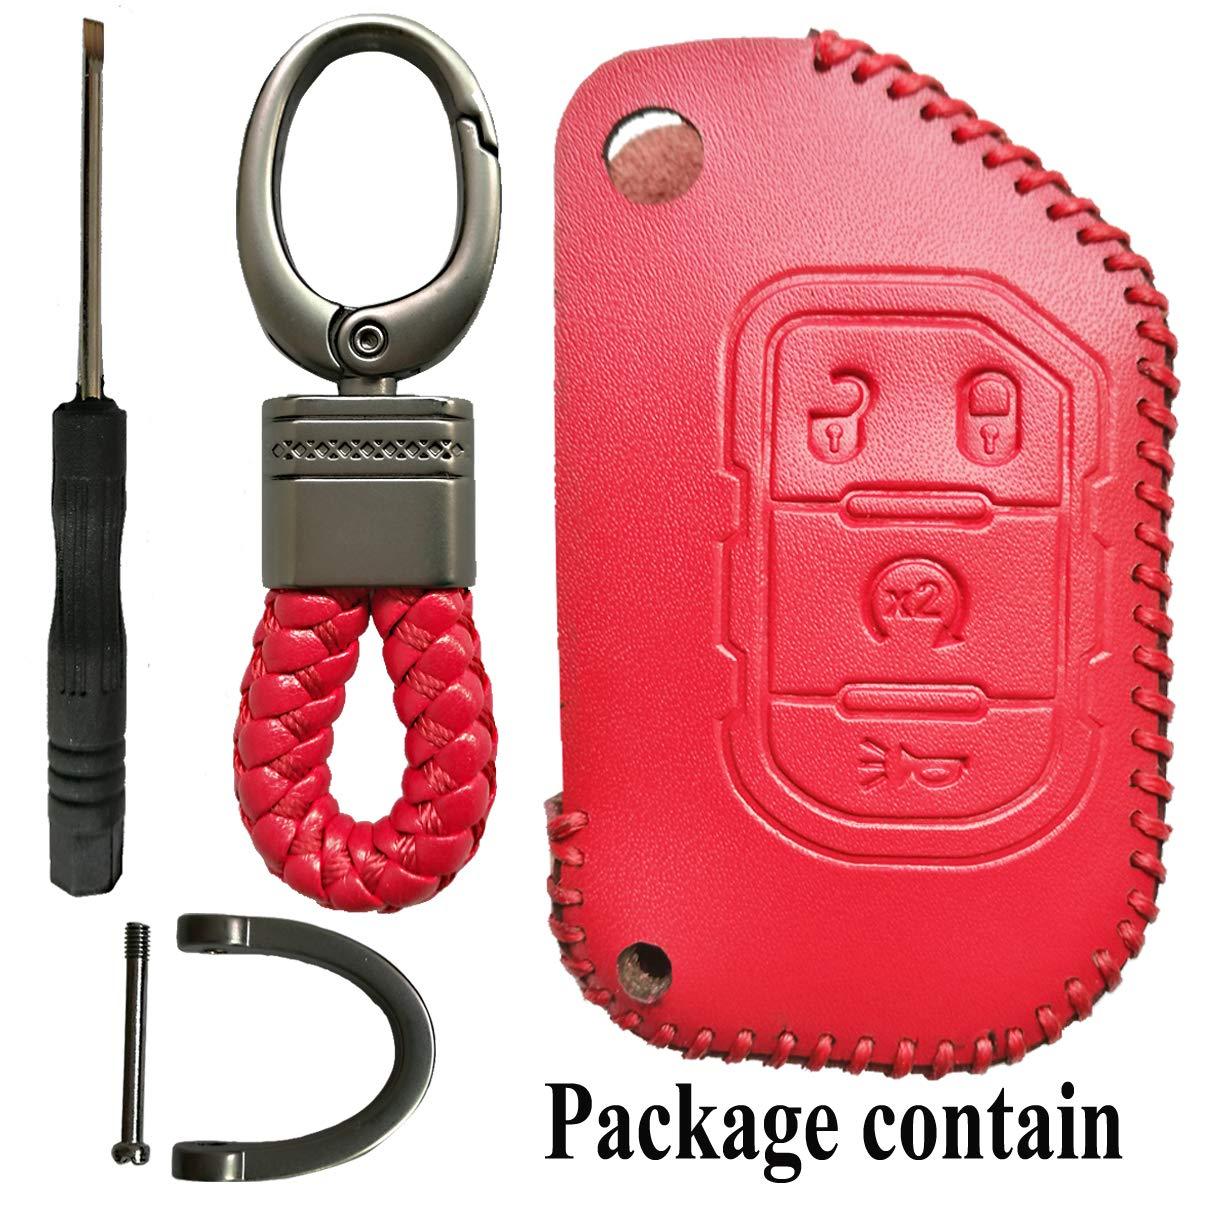 Alegender Pink 4Buttons Flip Key Cover Case Fob Leather Skin Bag Remote Jacket Protector Fit for 2018 2019 2020 Jeep Wrangler JL JLU Rubicon Gladiator JT 68292944AA